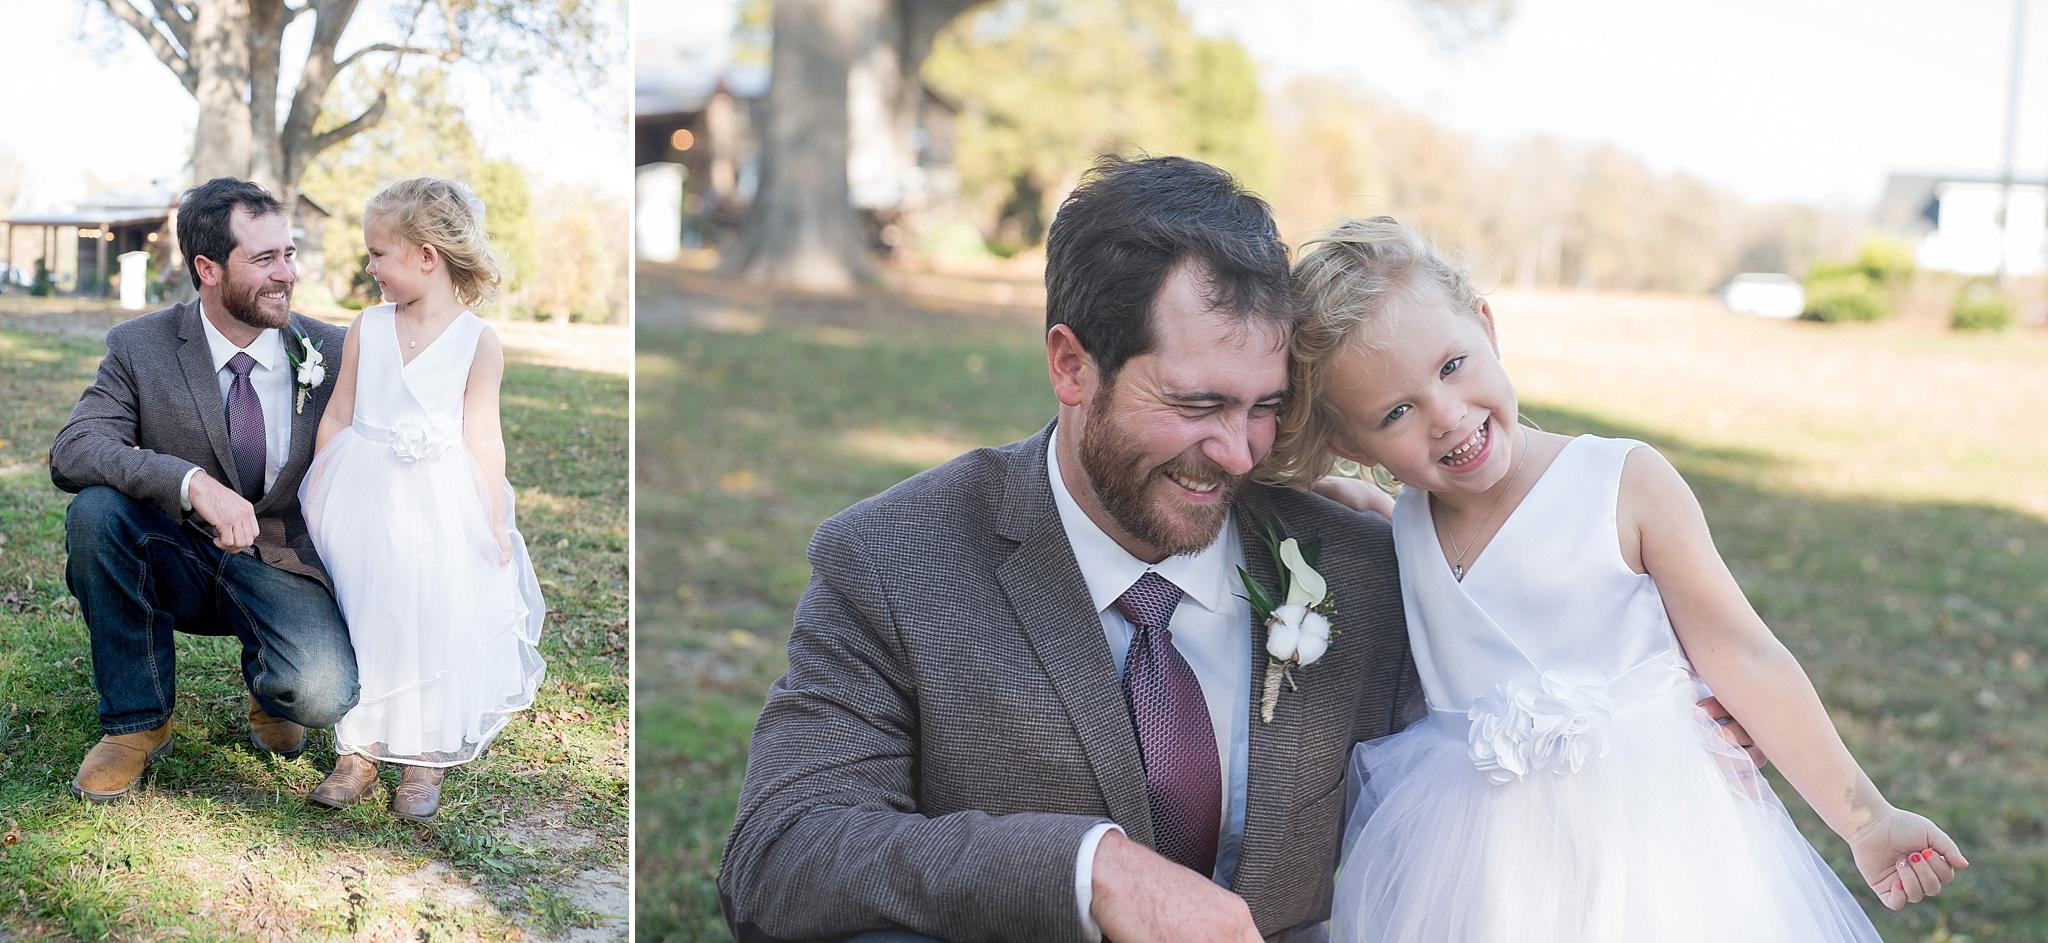 May-Lew-Farm-Farmville-NC-Wedding-Photographer-073.jpg